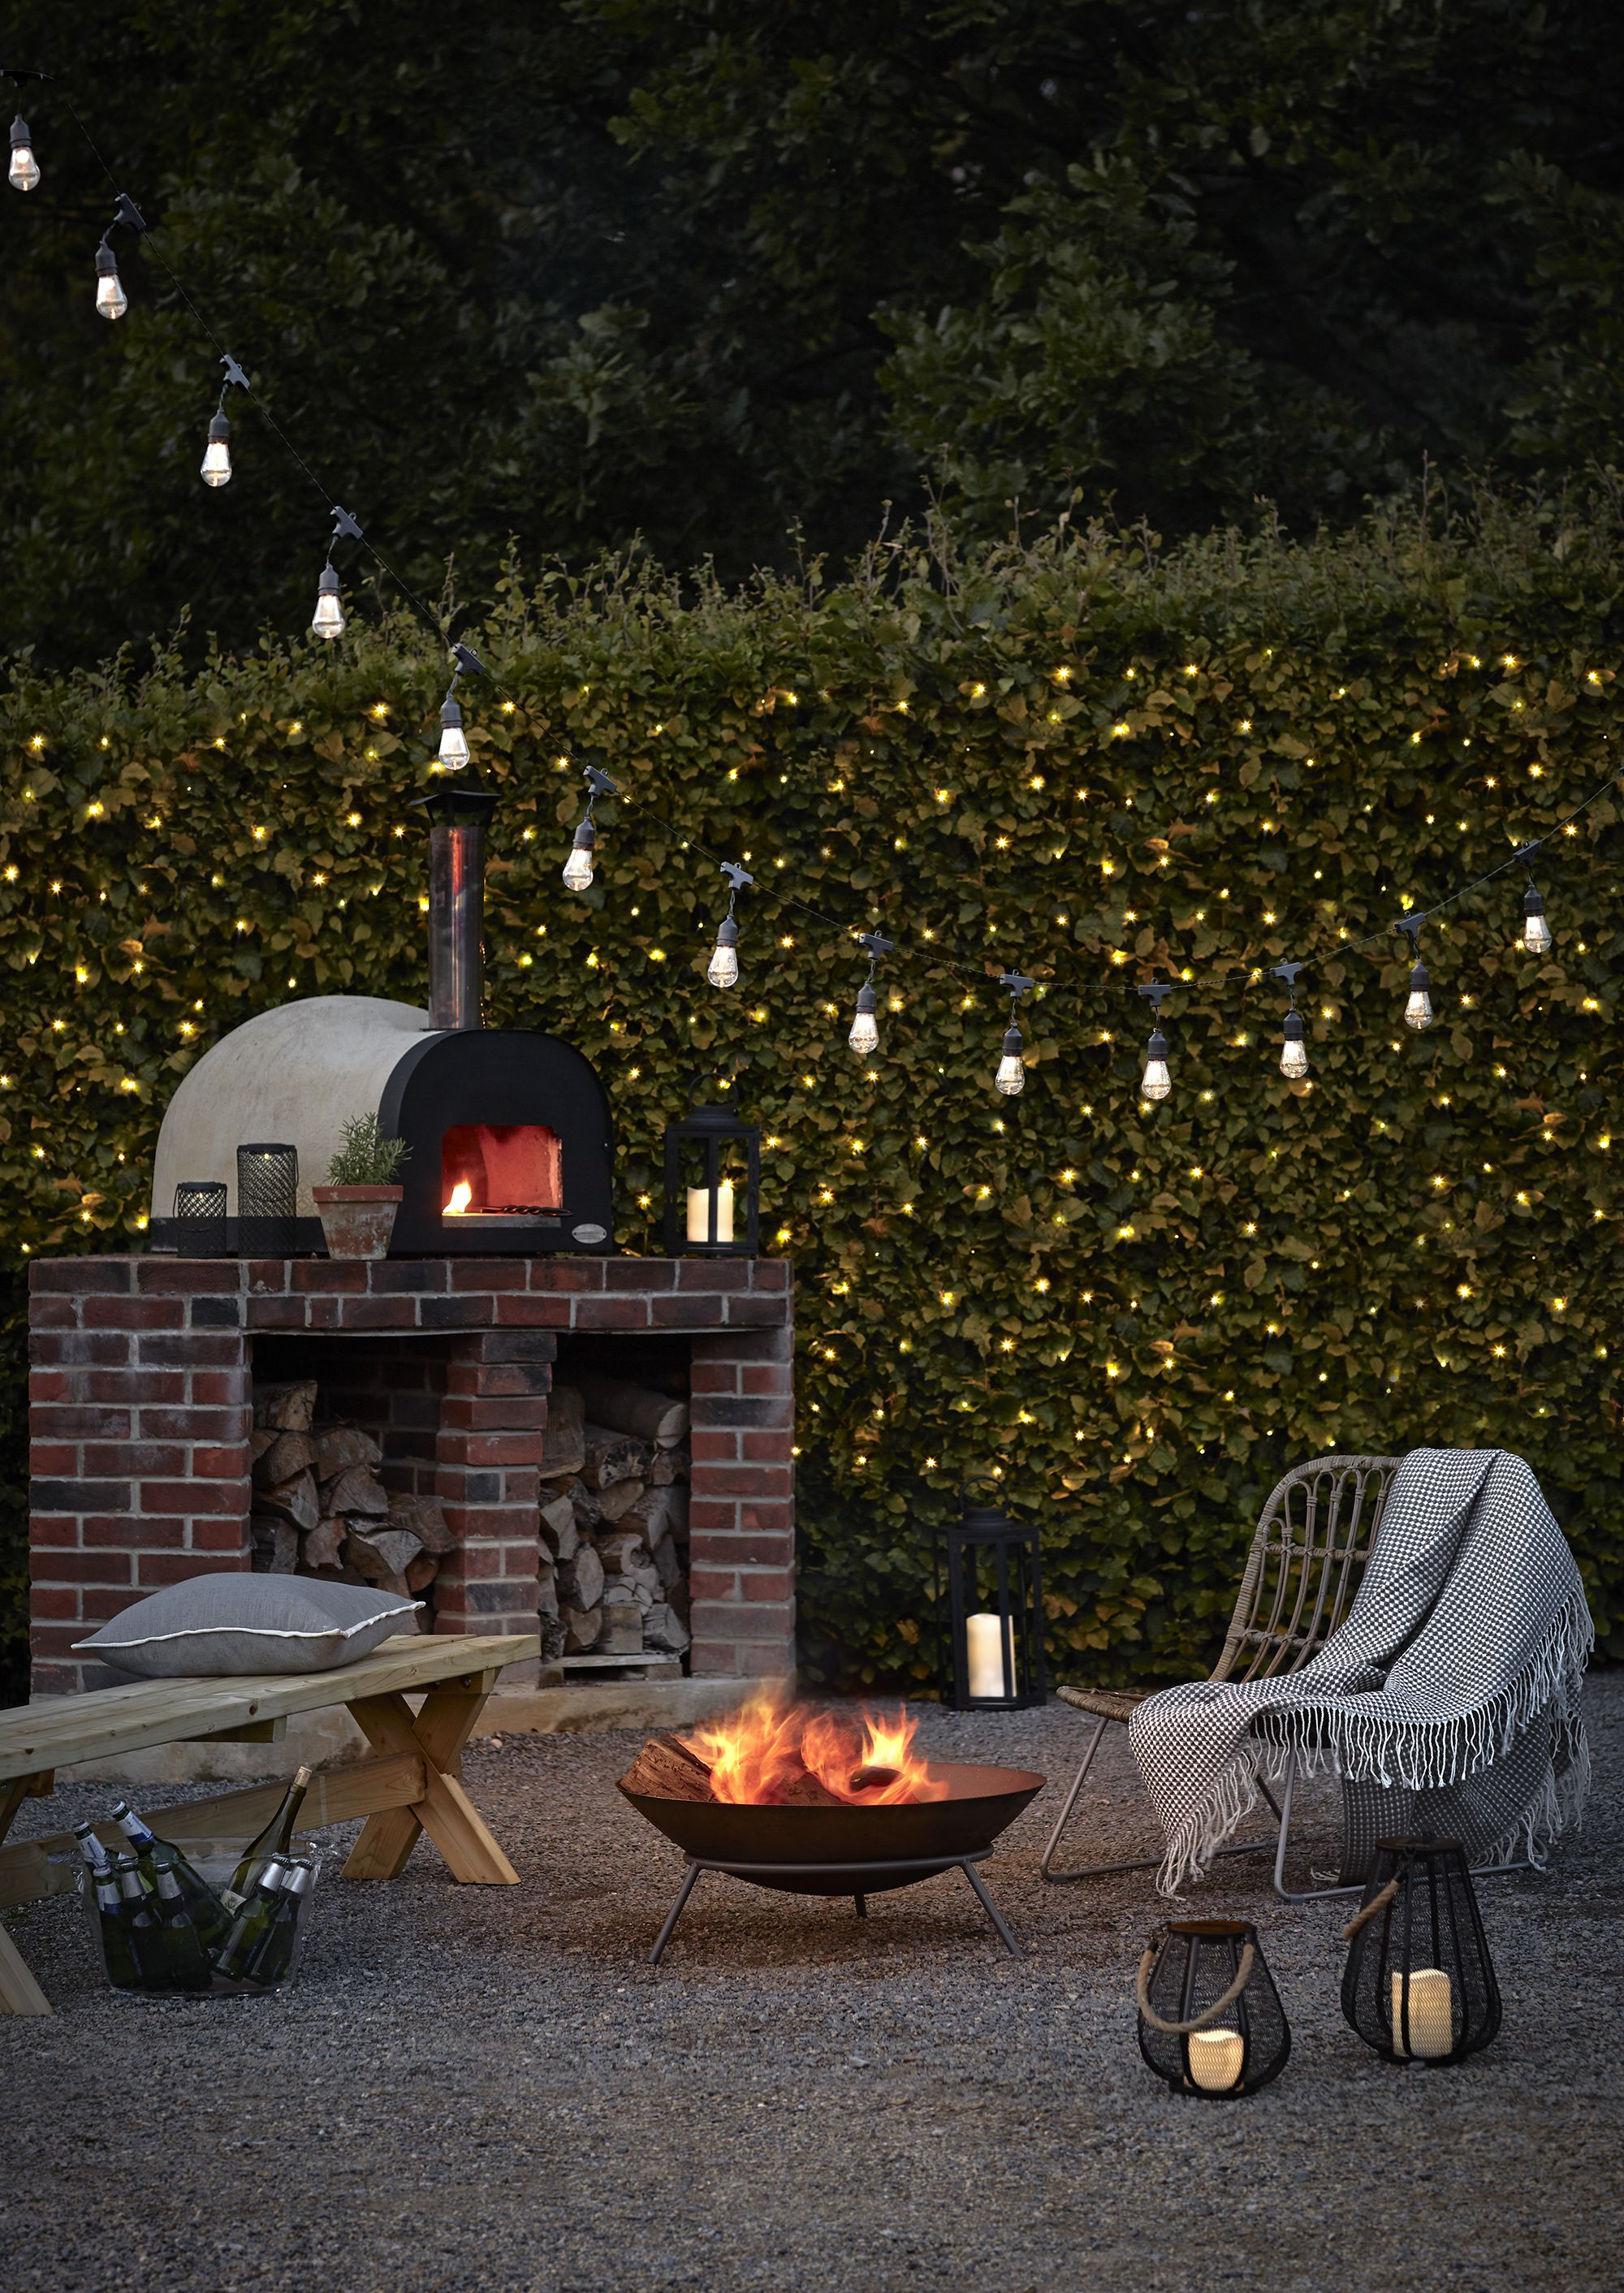 15 Drop Bulb Plug In Festoon Lights Backyard 2019